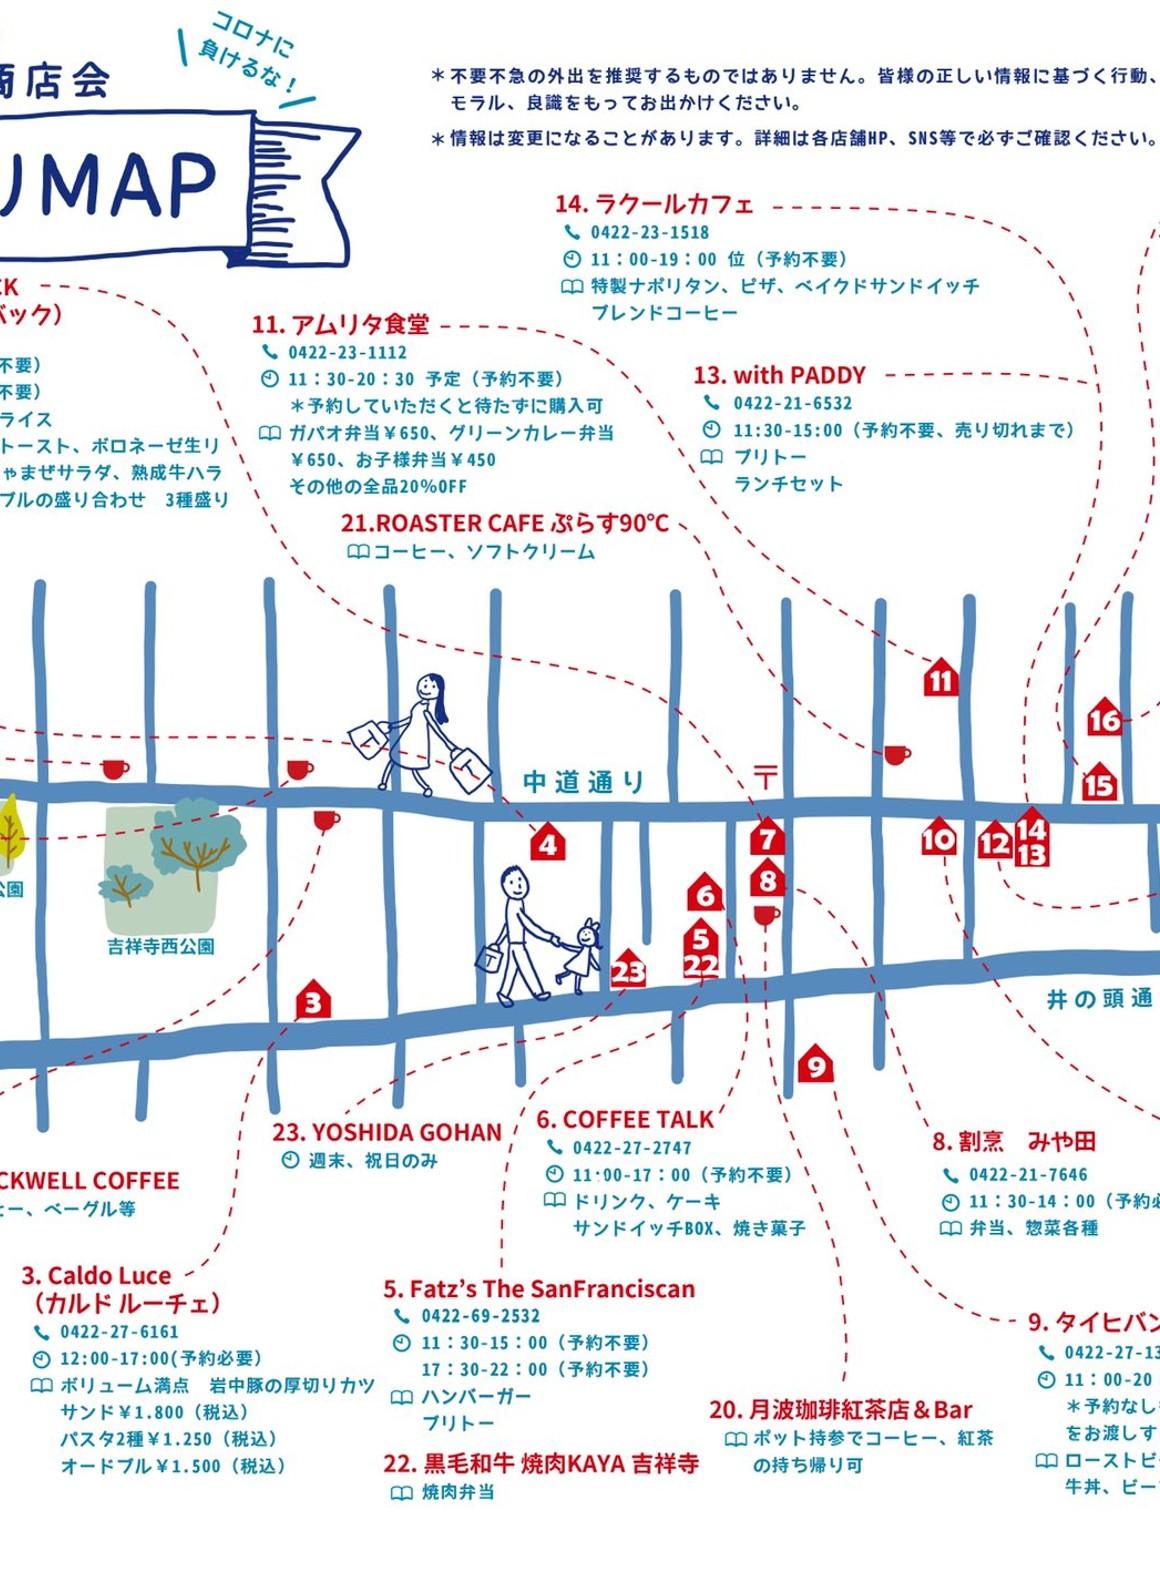 Kichijoji Nakamichi-dori Shopping Street Togo MAP③